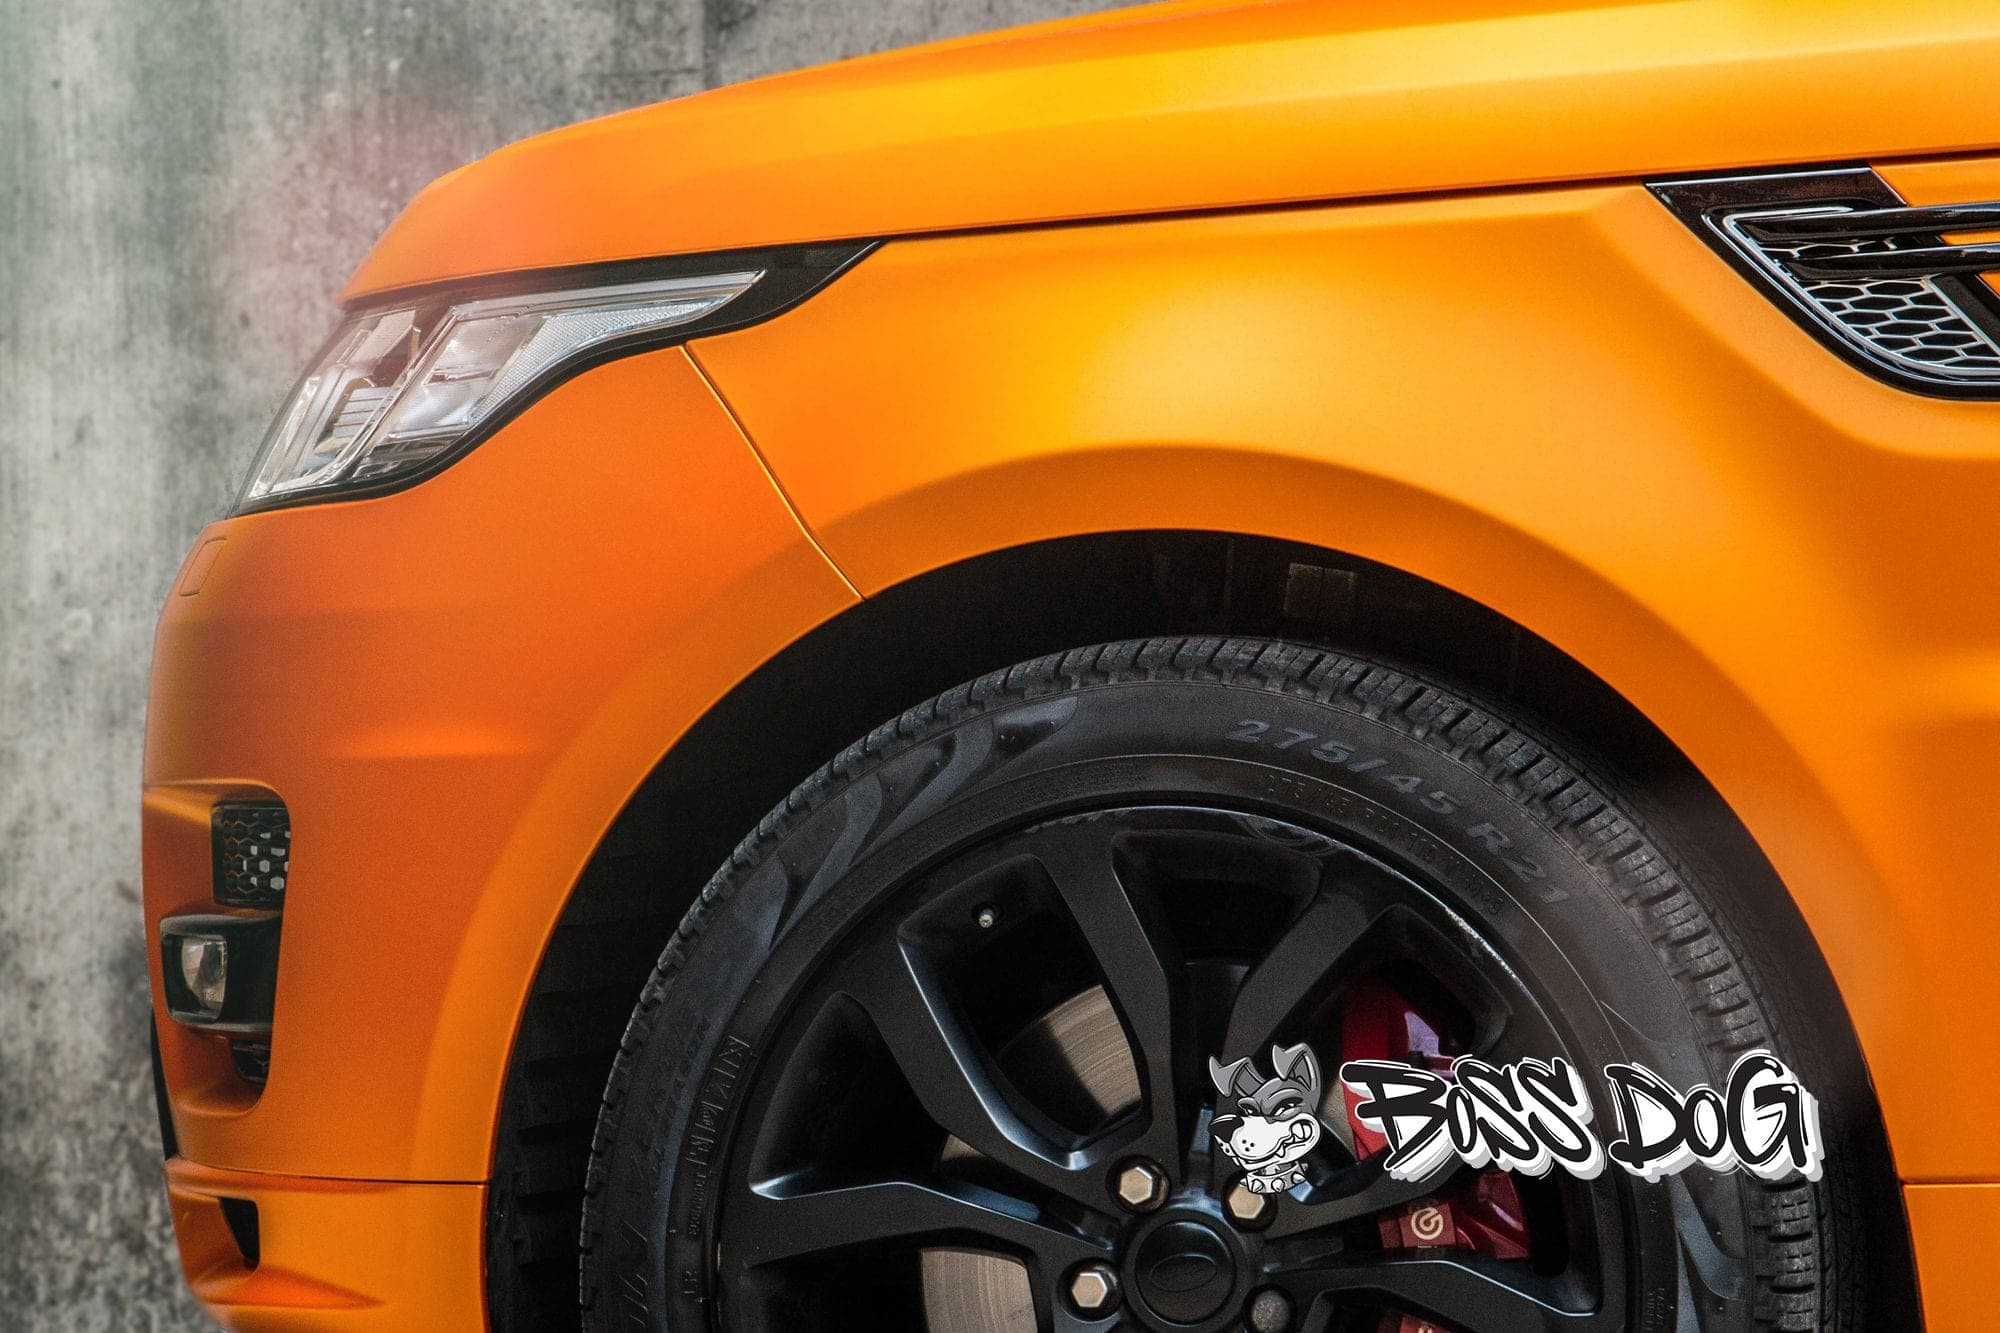 Range rover sport wrapped in matt metallic orange